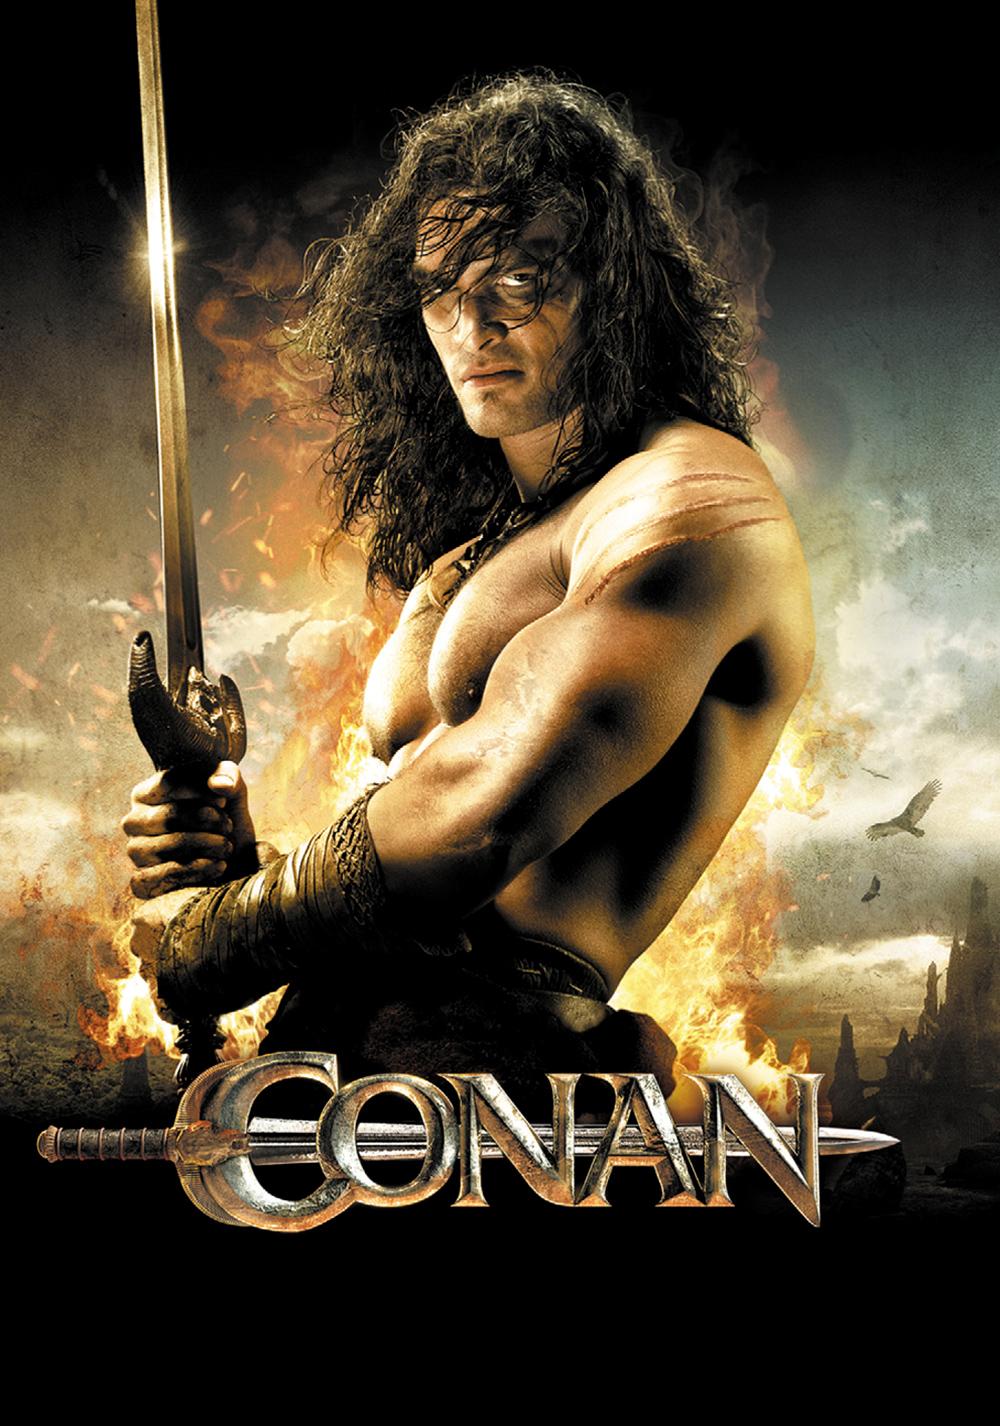 conan the barbarian 2011 dual audio movie download